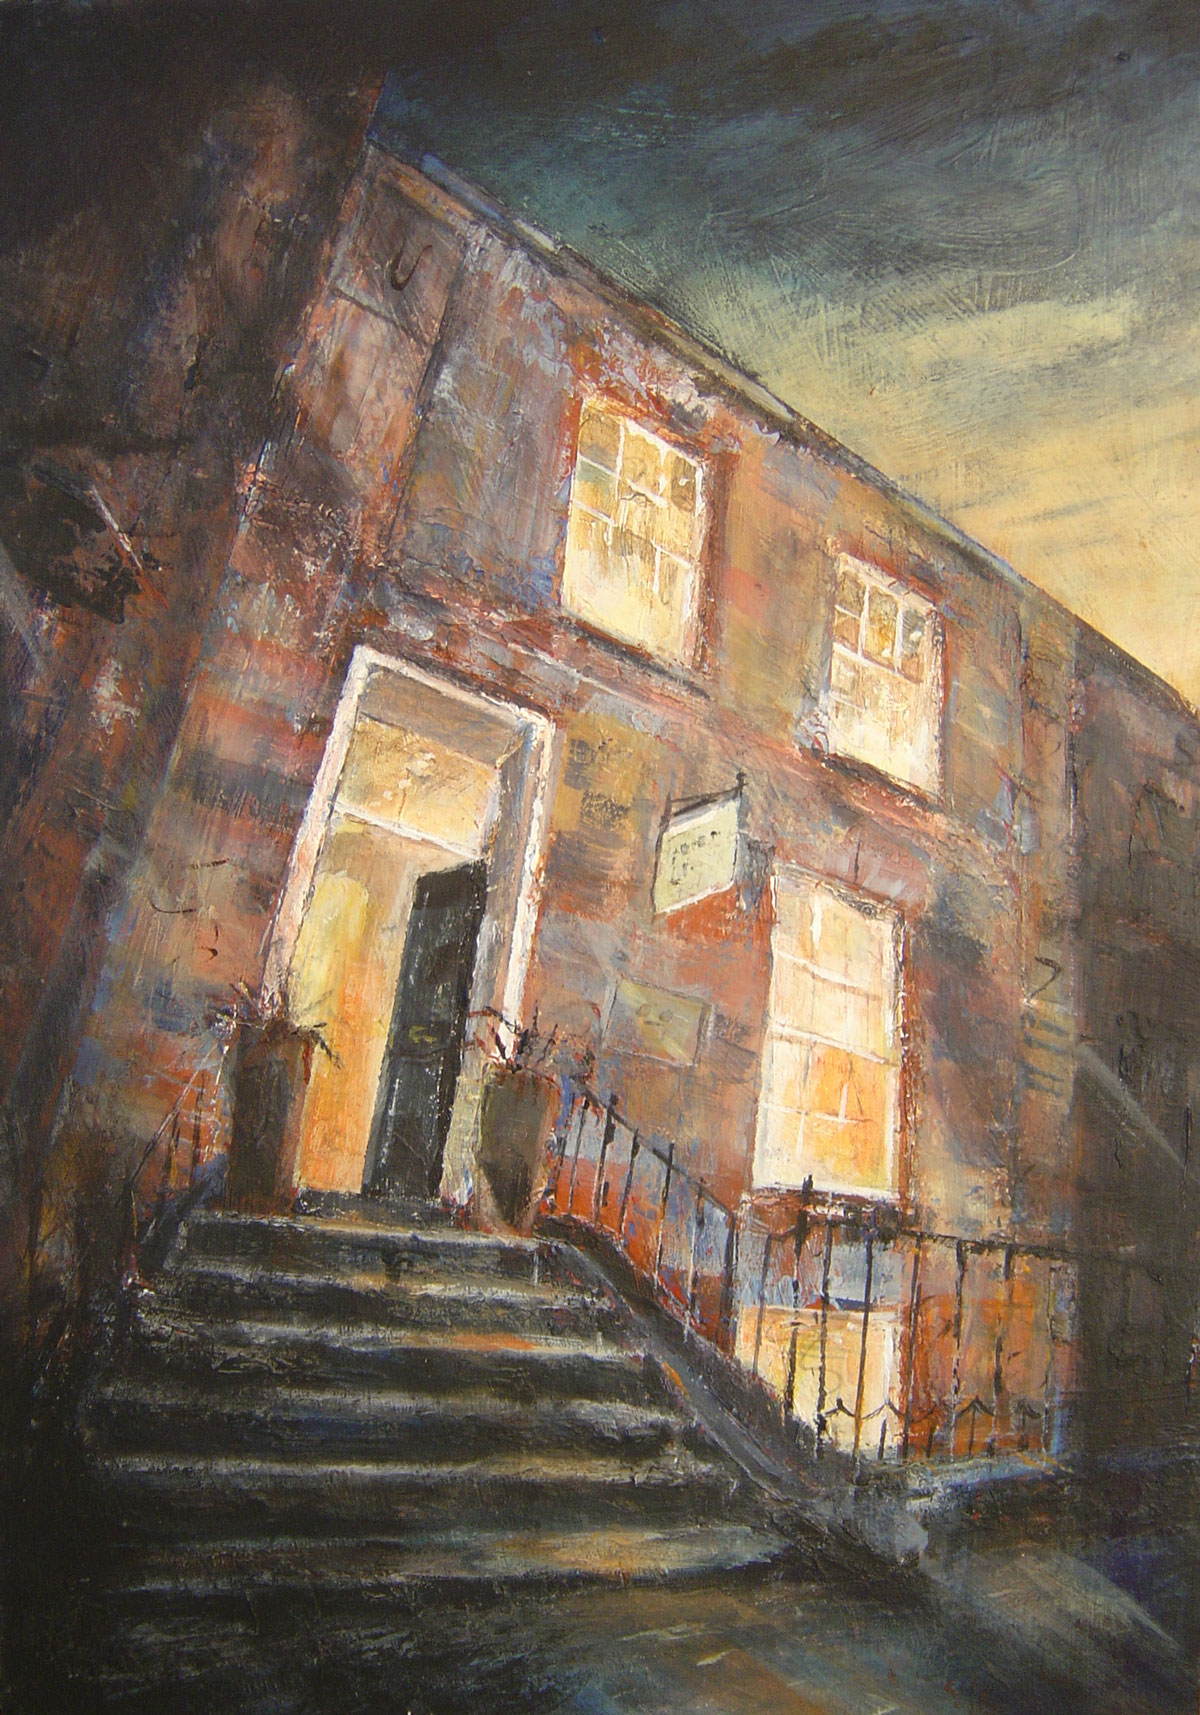 Lemon Street Gallery, Truro 43 x 30 cm